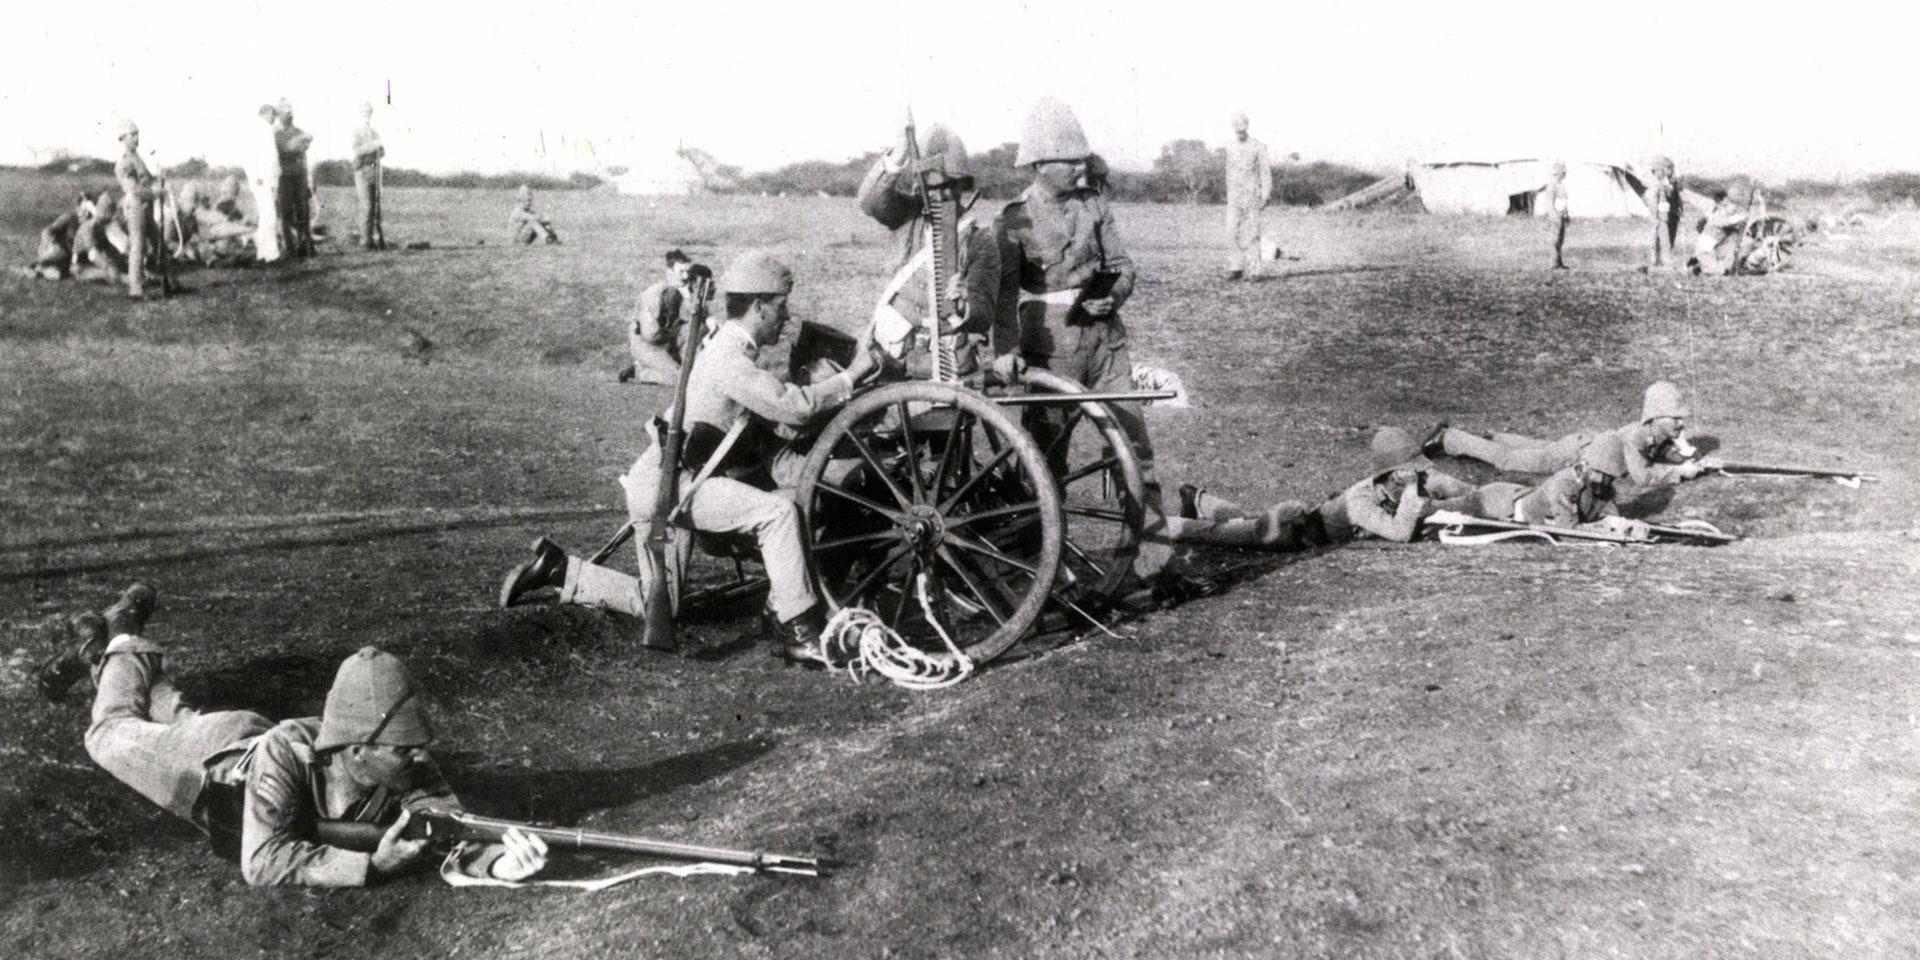 Members of The King's Own Yorkshire Light Infantry training with Gardner Guns, c1890